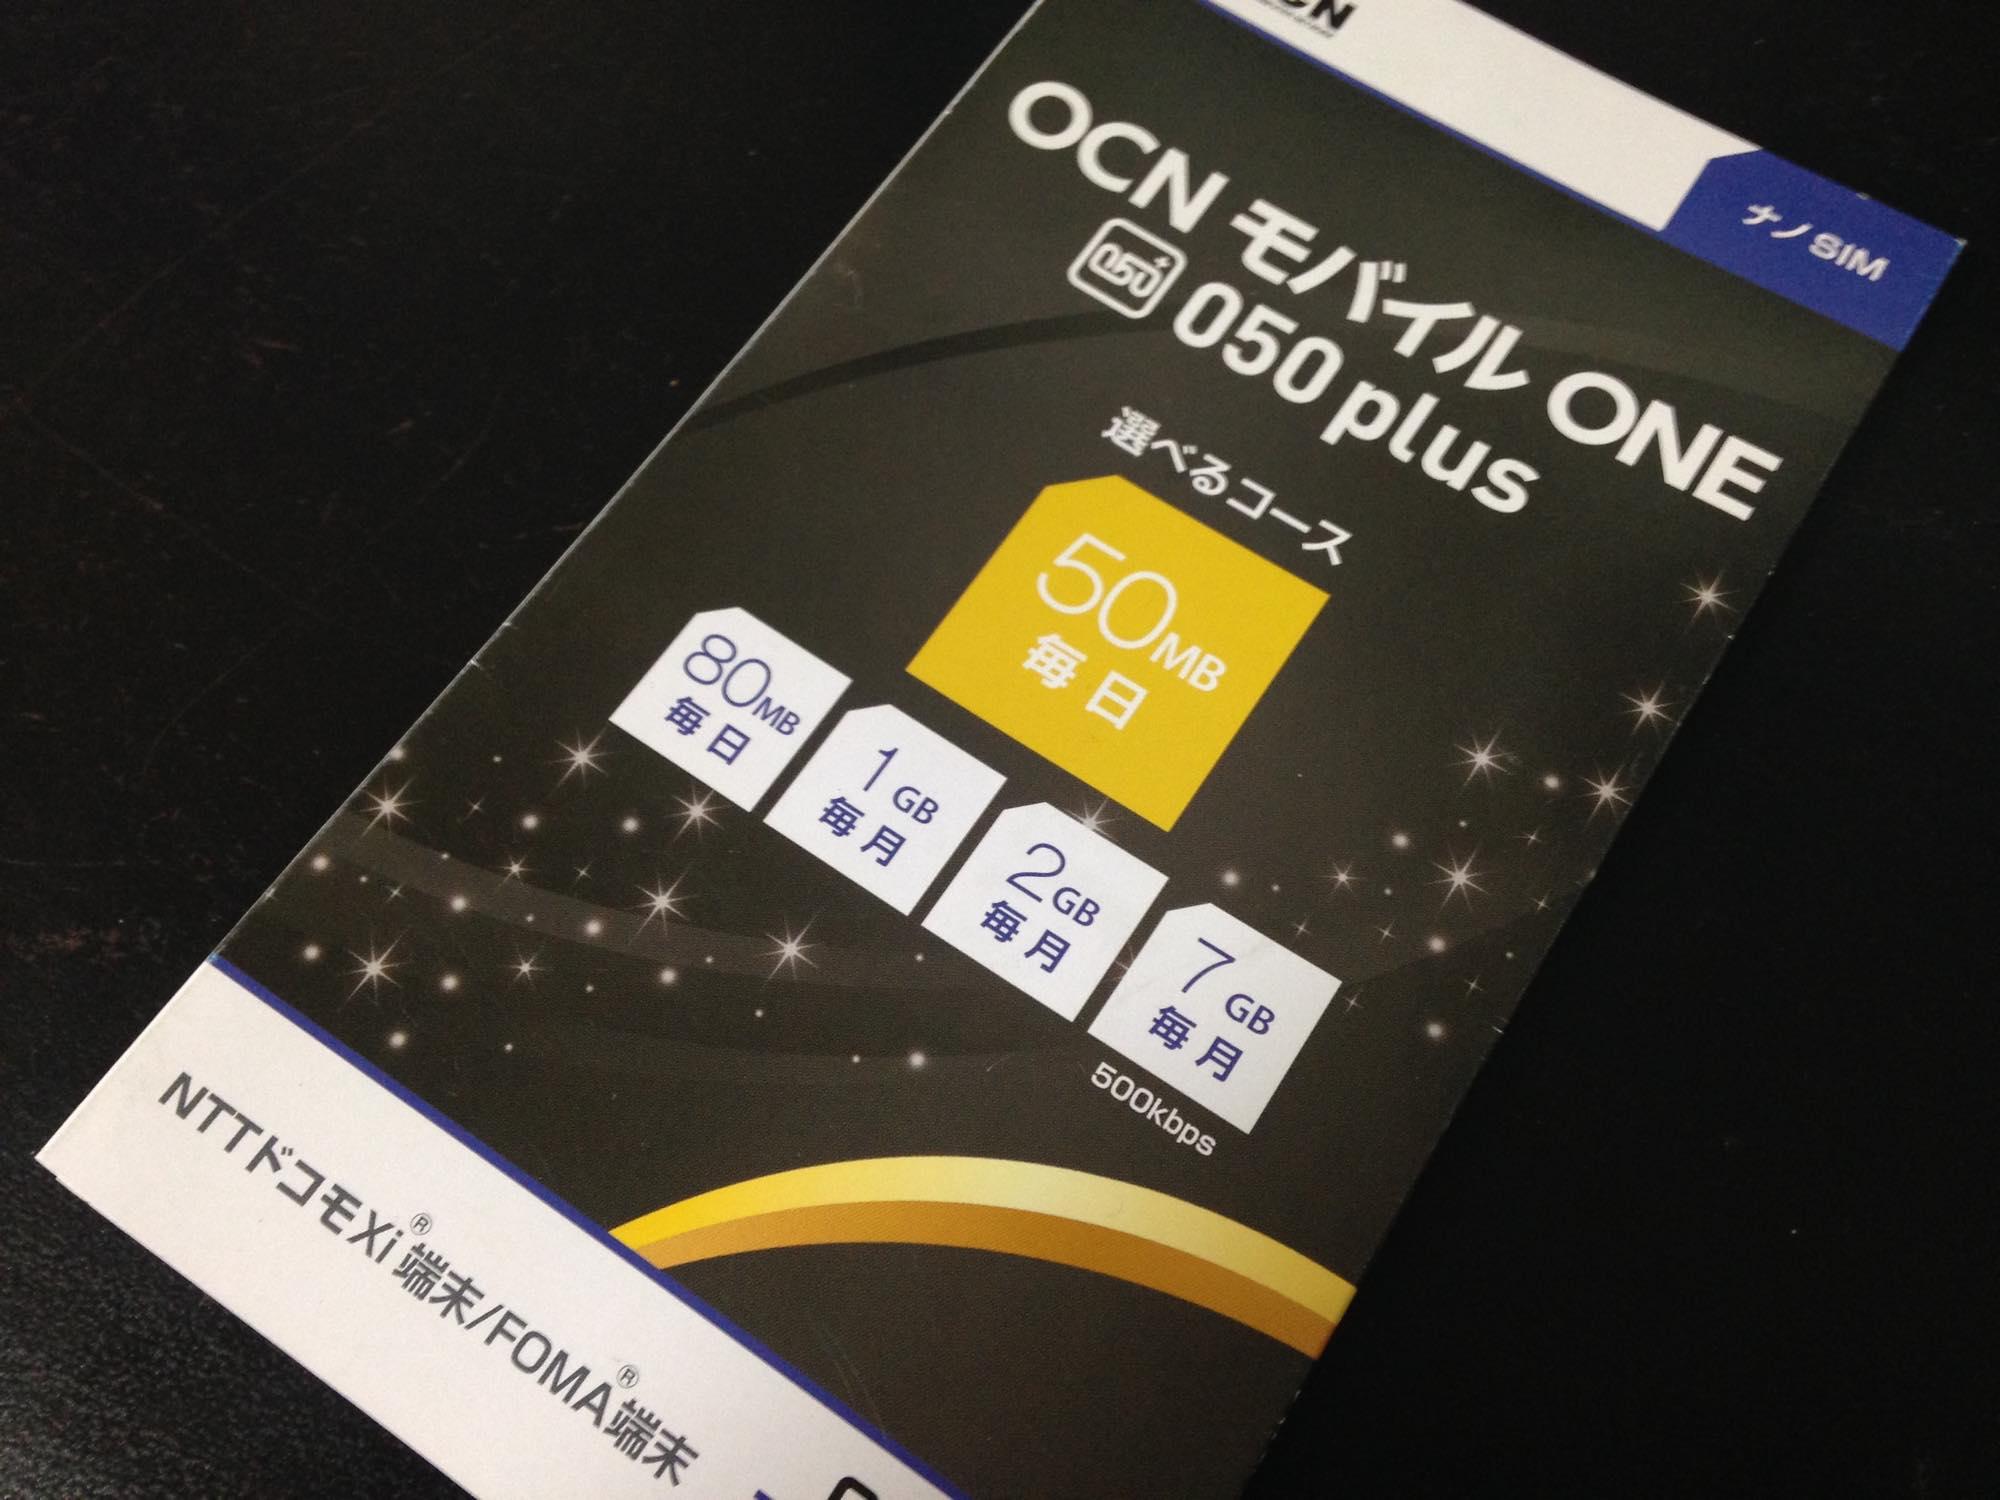 050plus ocnモバイルone